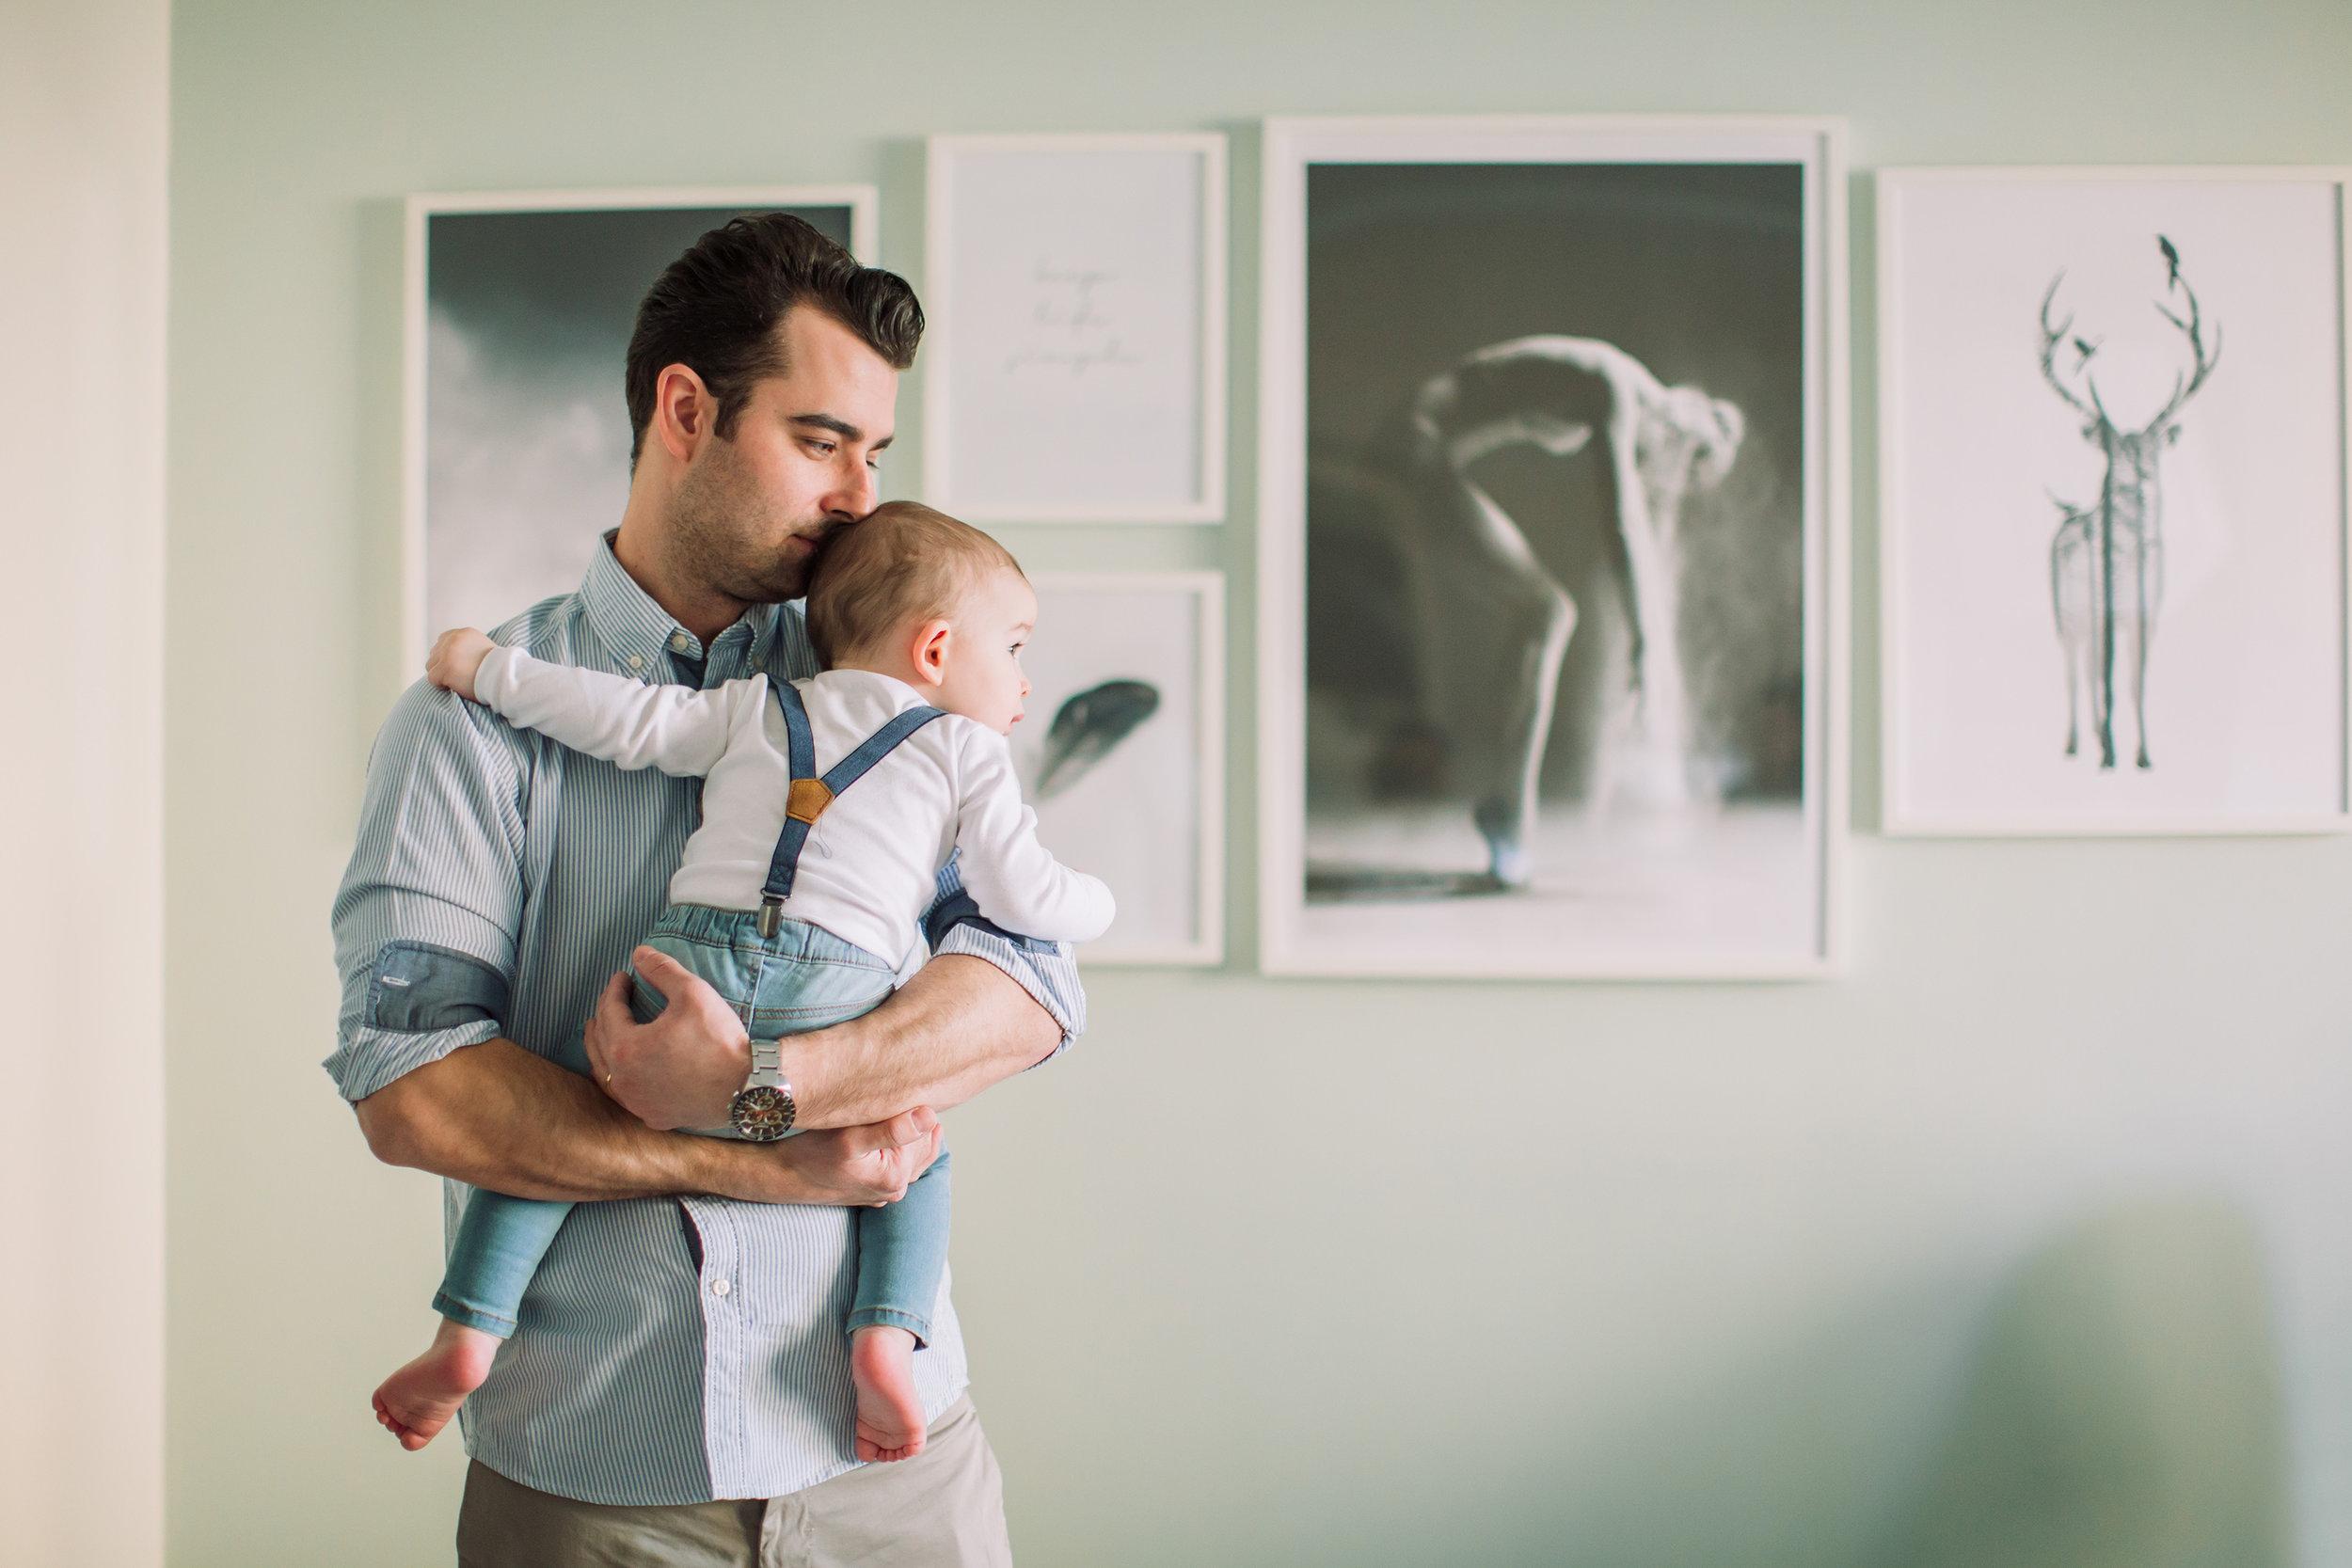 Lifestyle-Familjefotografering_Stockholm_Familjefotograf_Anna_Sandstrom_10.jpg